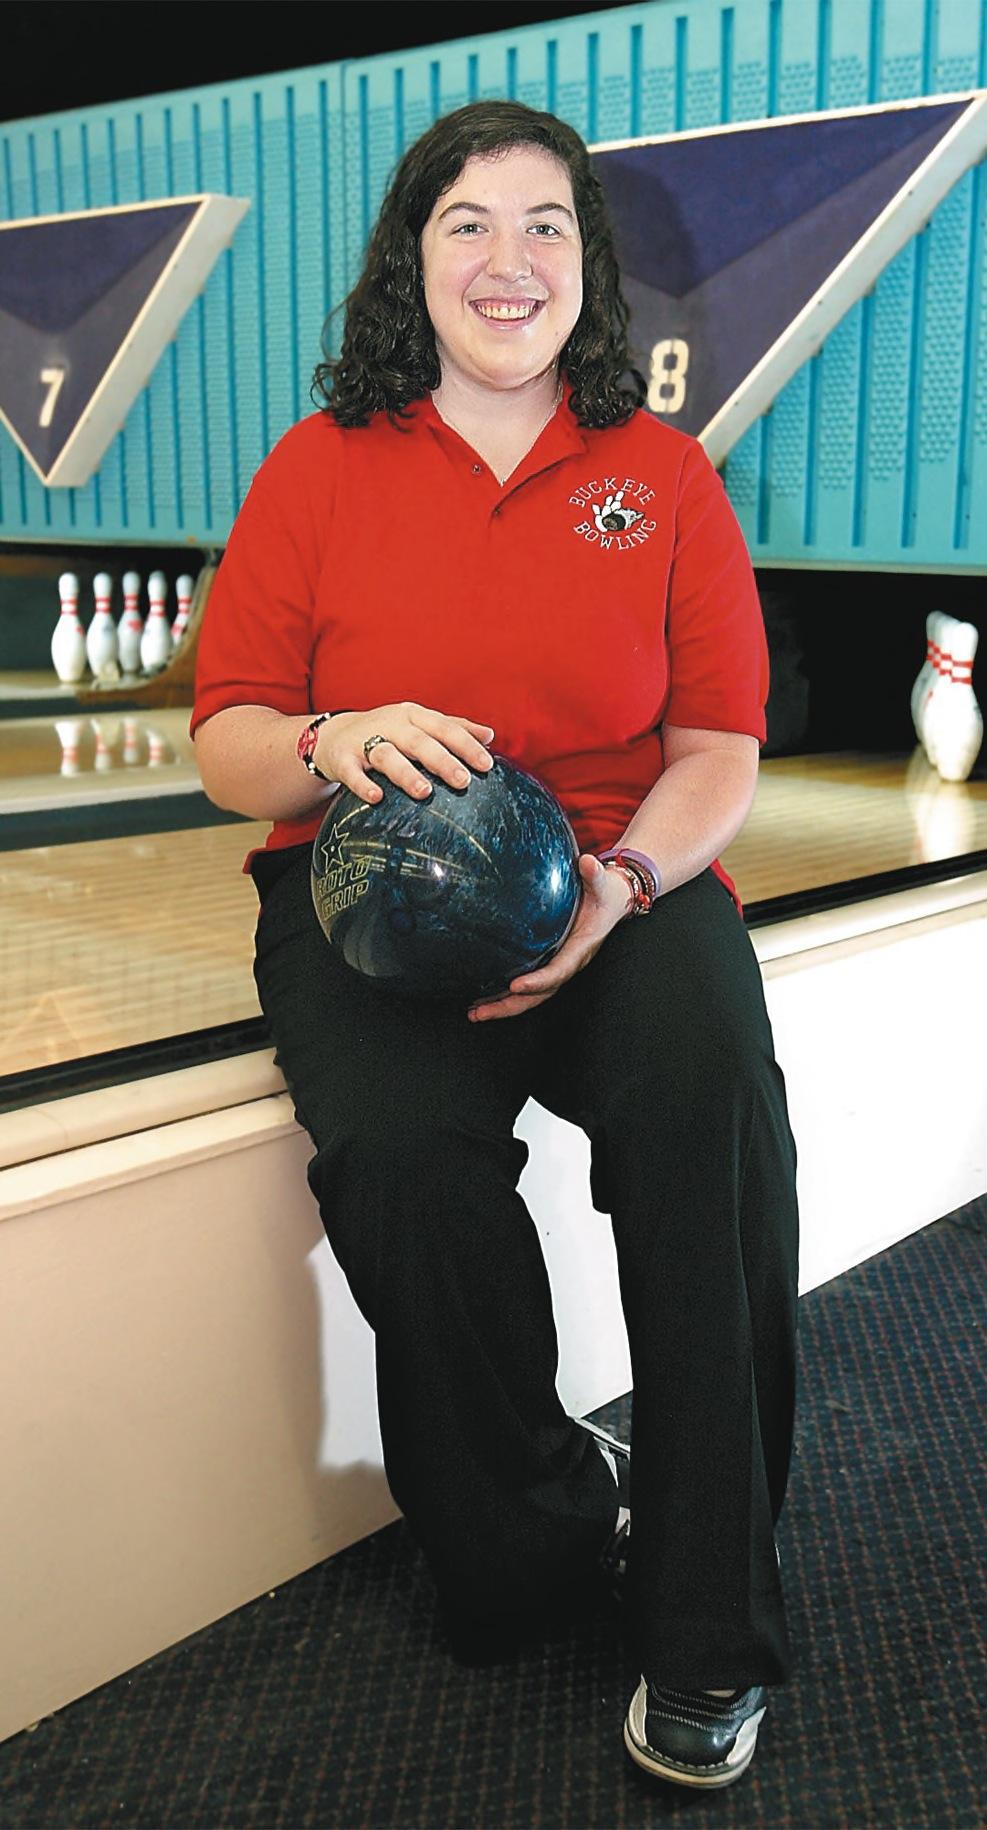 Blair Blumenscheid '09 Ohio State University (photo credit - ThisWeek News)